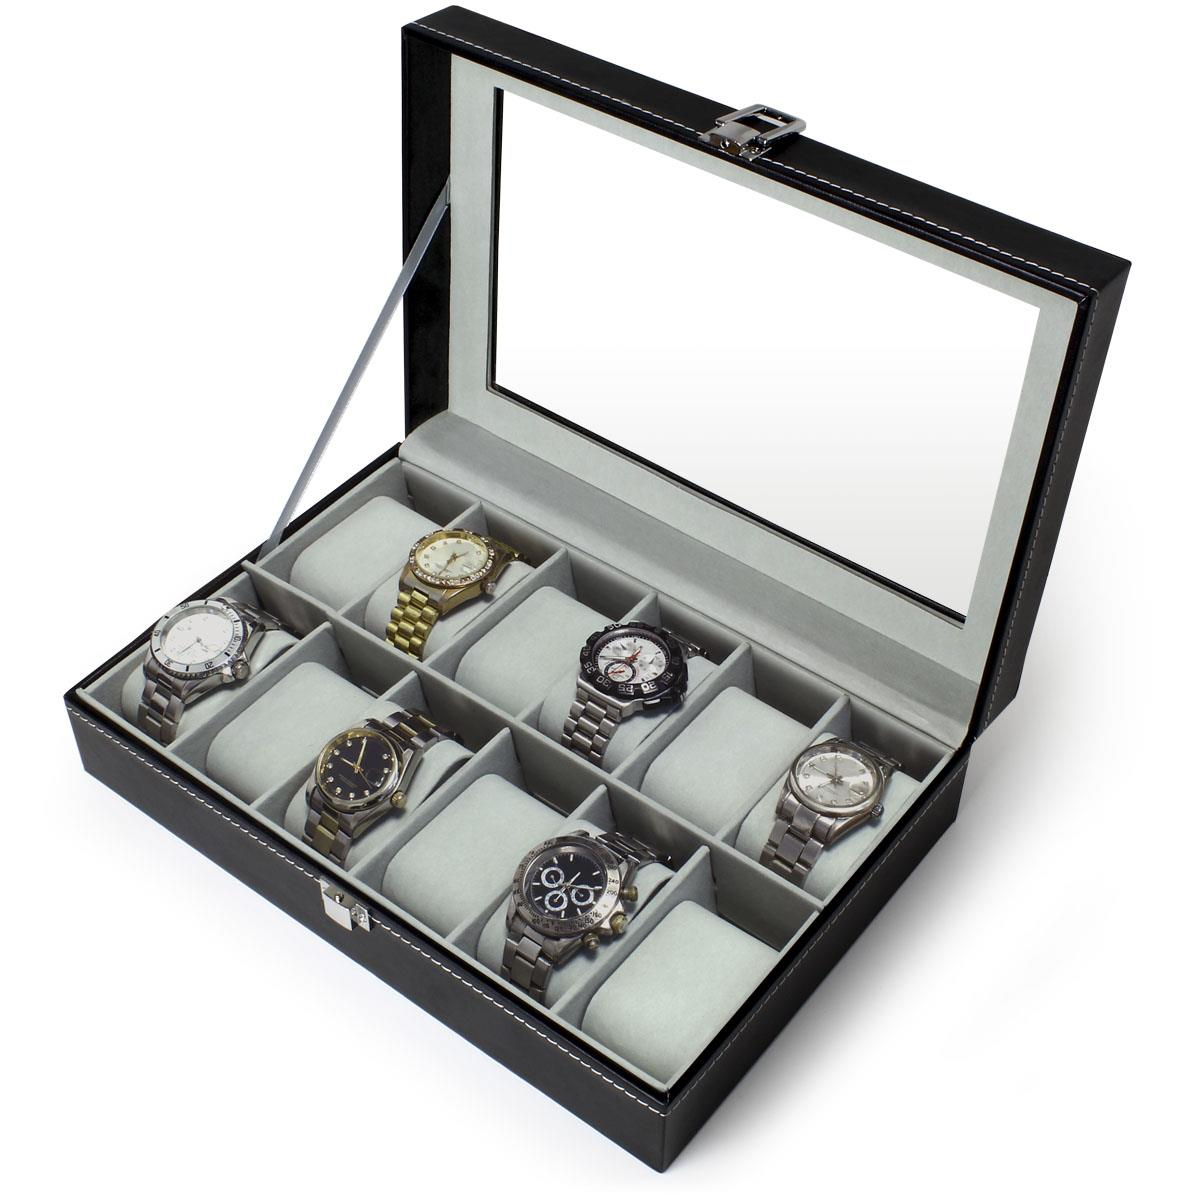 6-12-Watch-Case-Display-Box-Storage-Travel-Men-Women-Ladies-Gents-Jewellery thumbnail 7